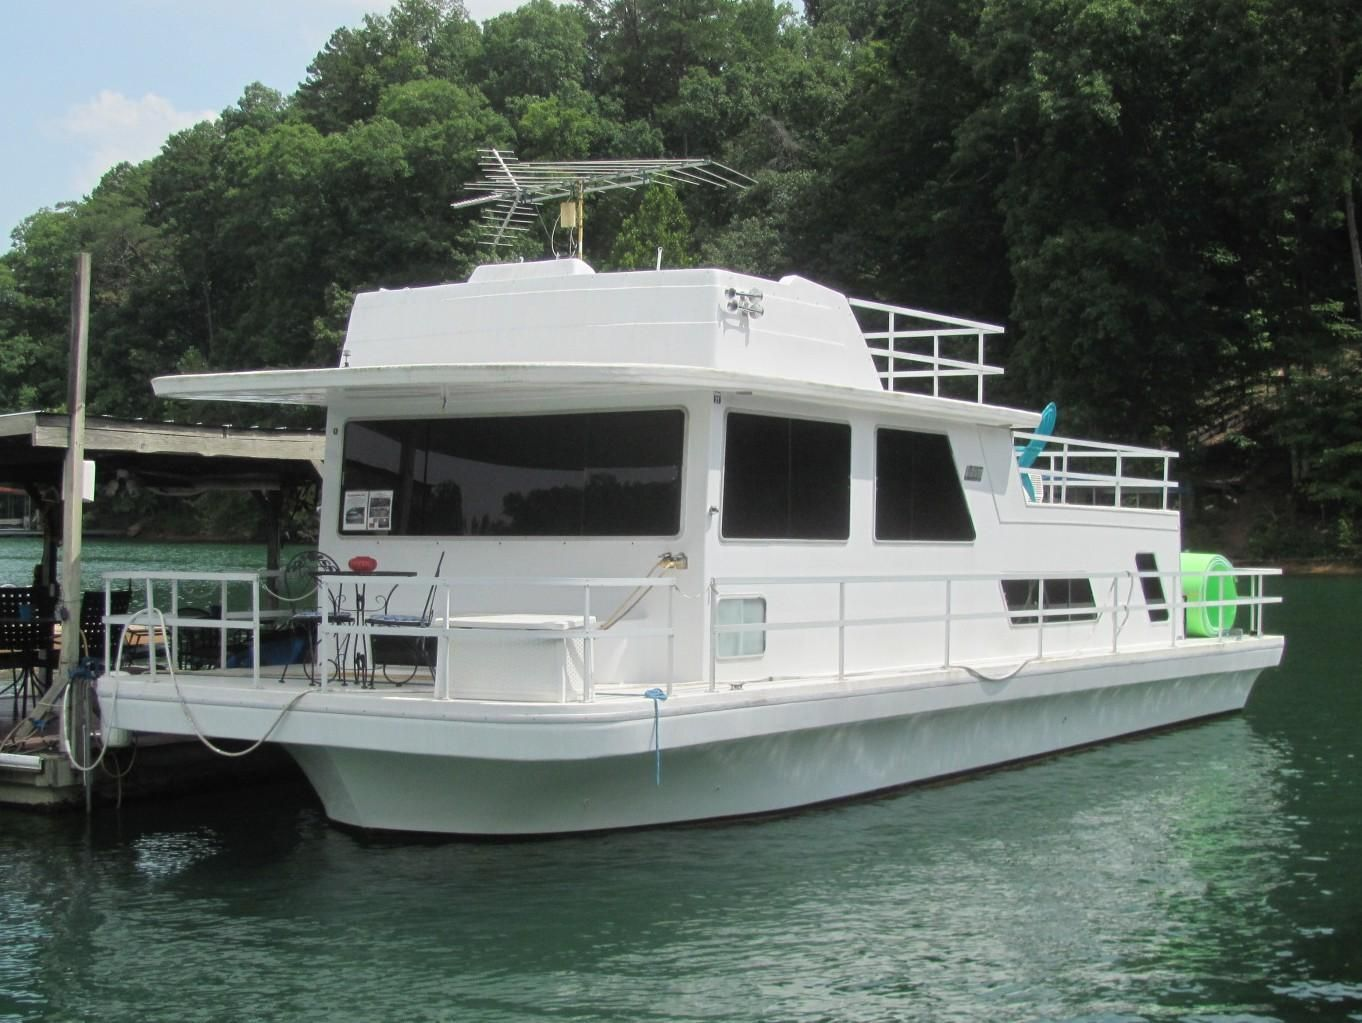 1985 gibson 14 x 44 power boat for sale. Black Bedroom Furniture Sets. Home Design Ideas